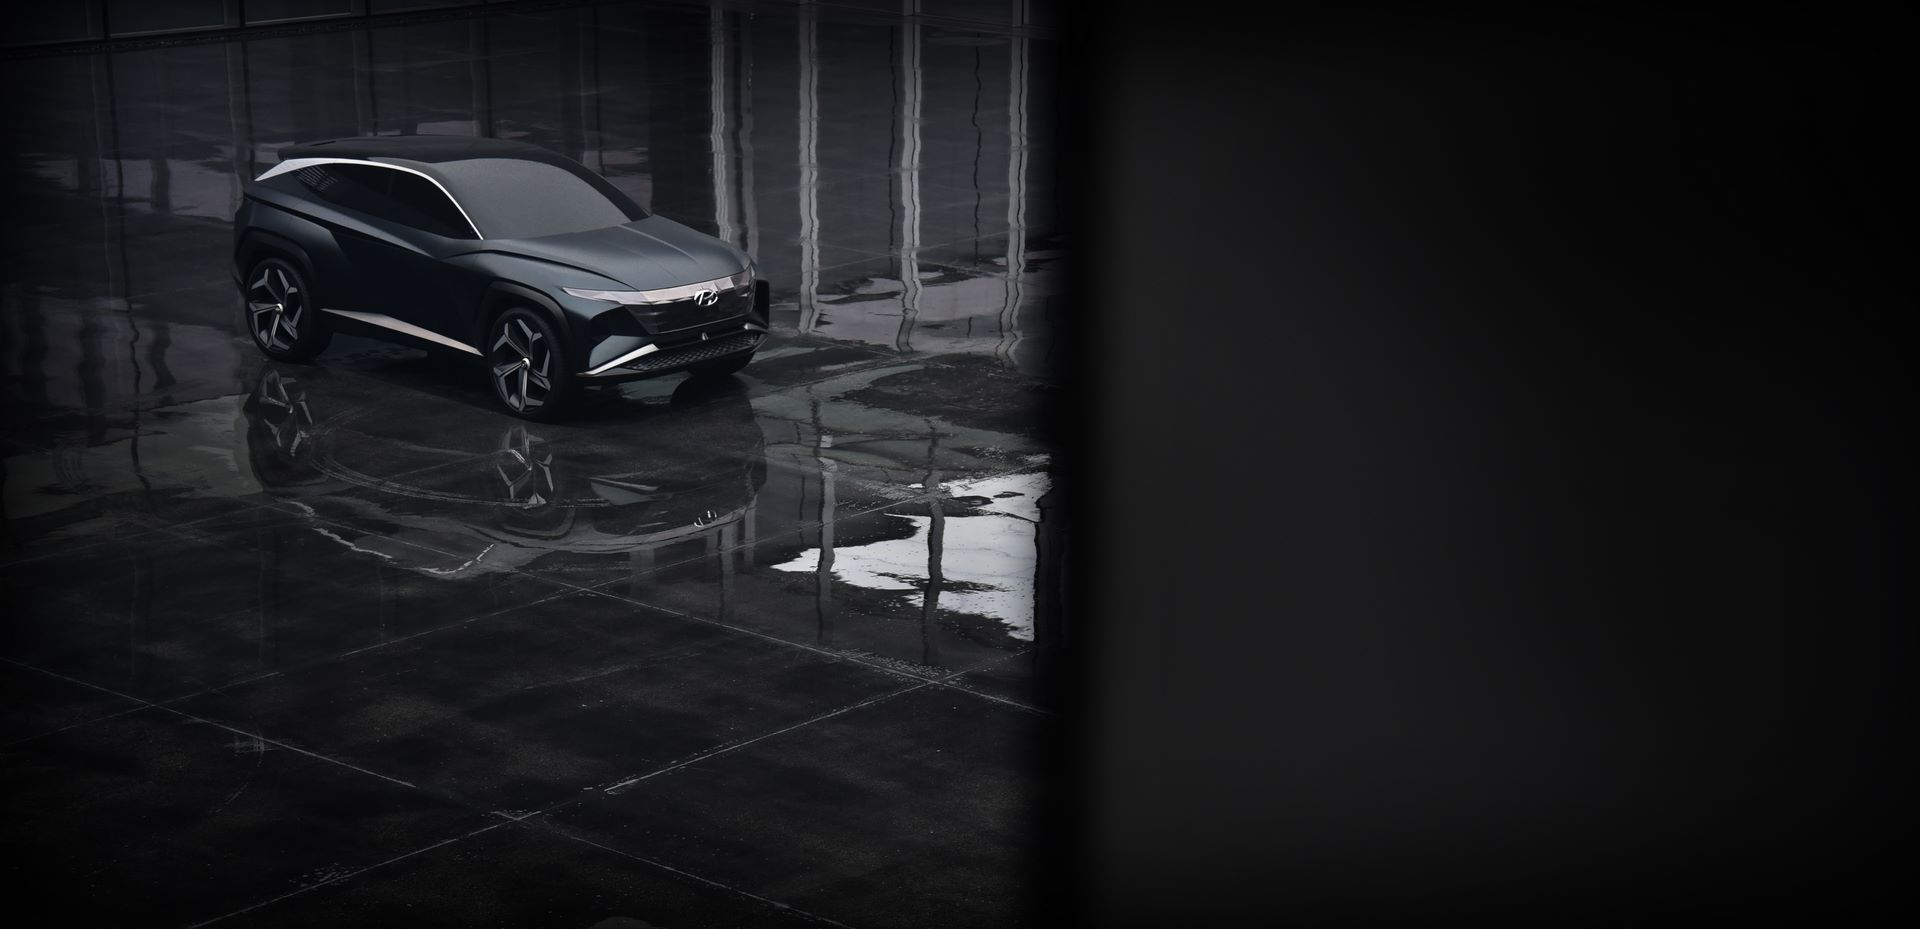 Hyundai-Vision-T-Concept-4